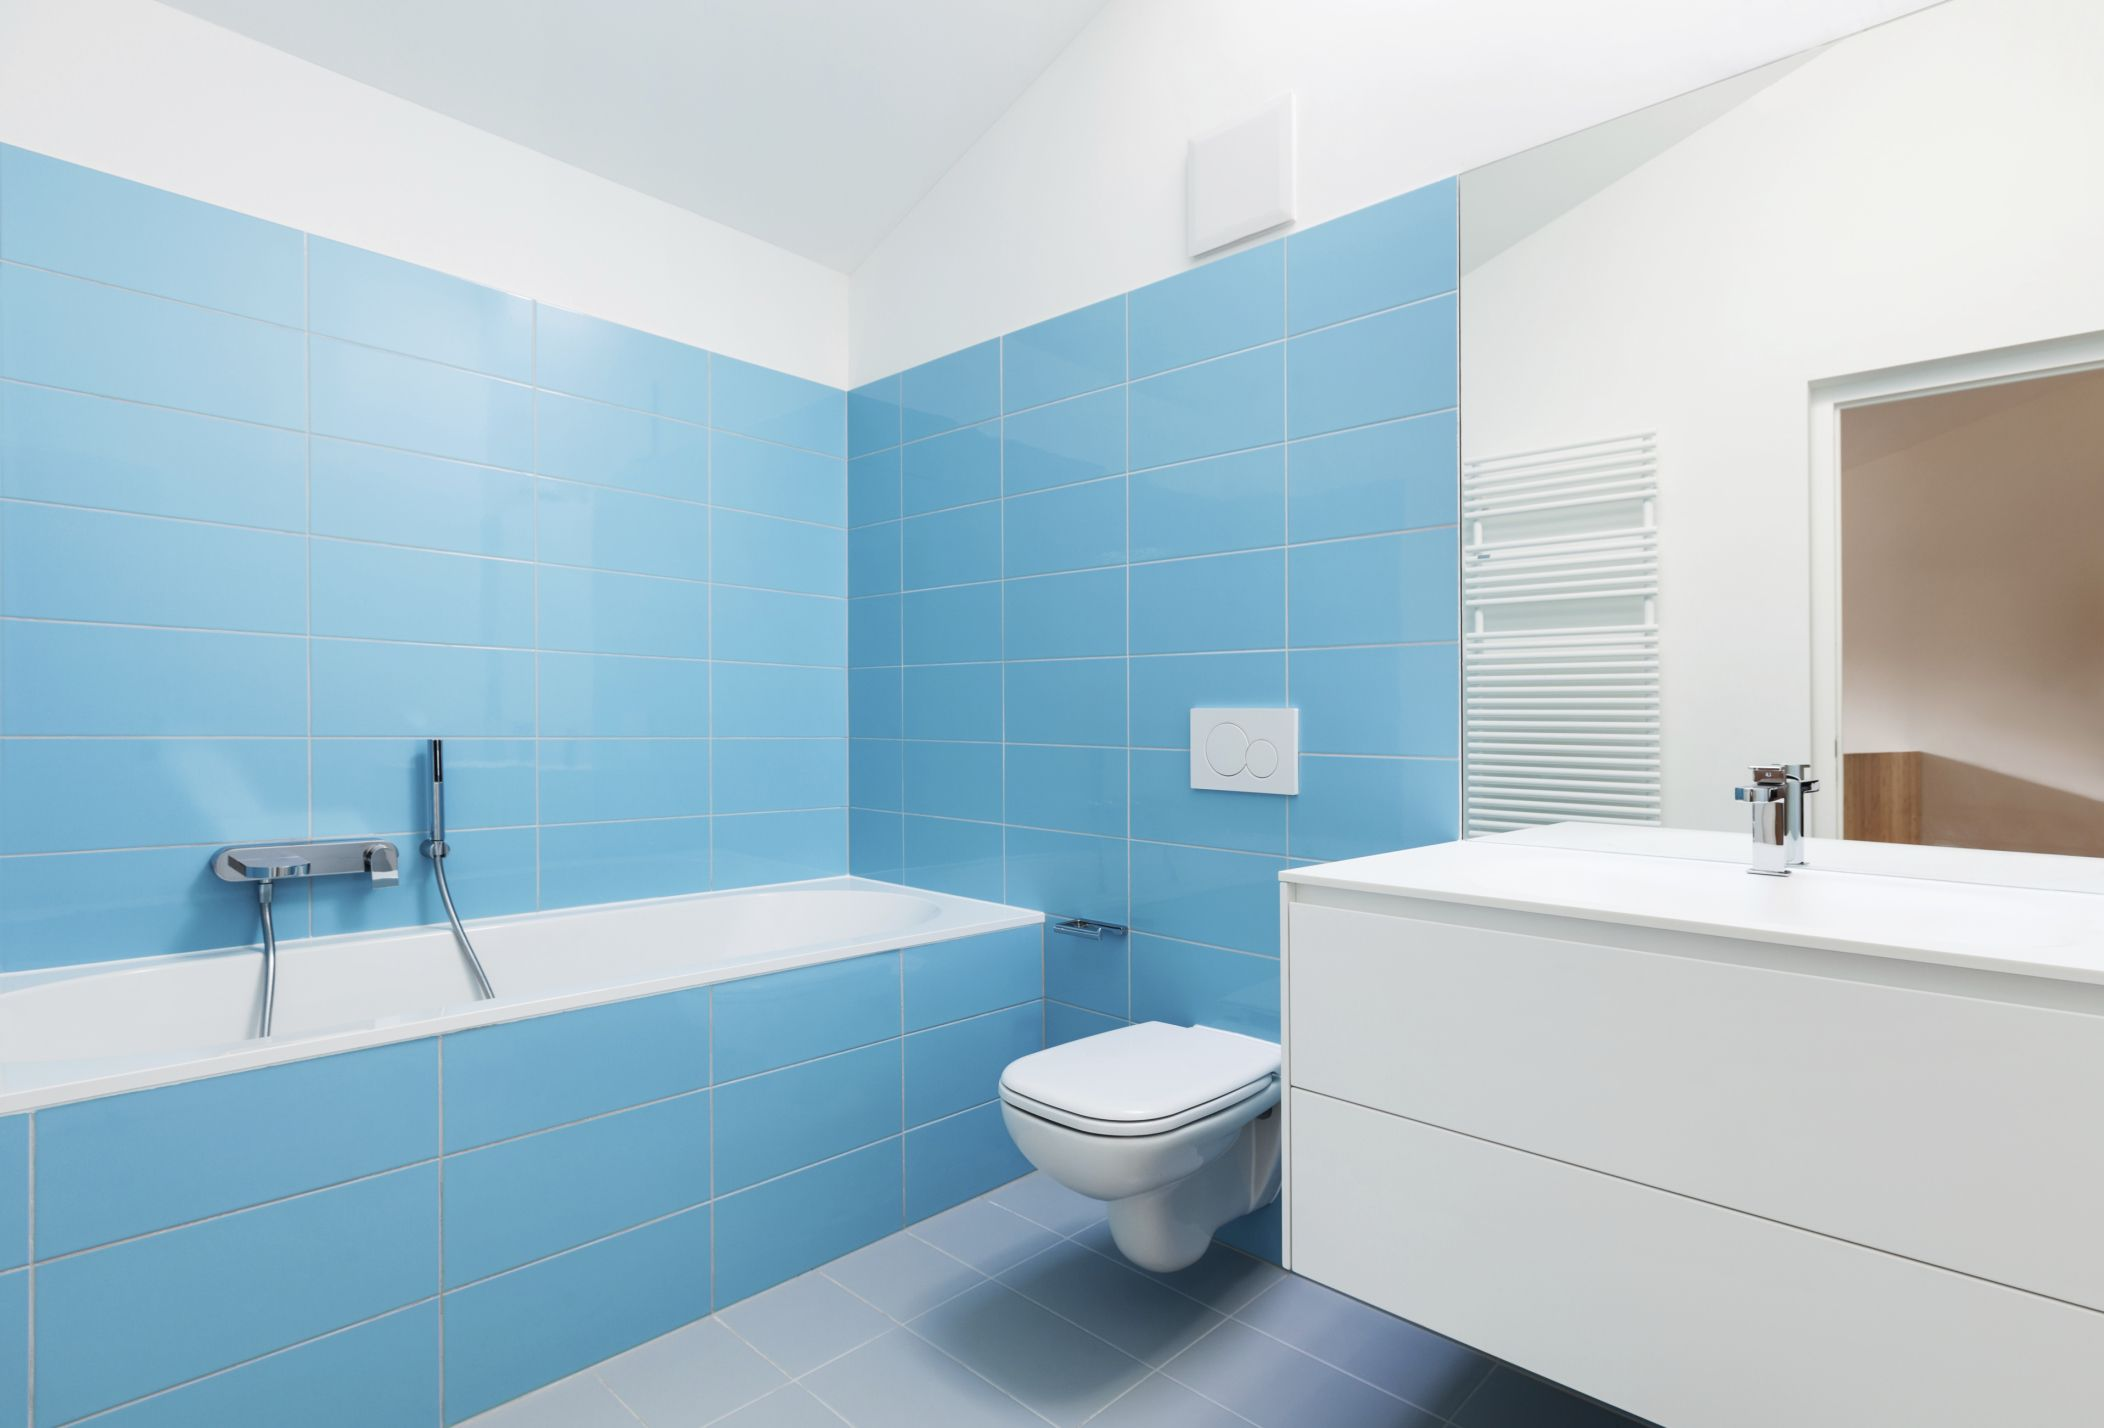 Interior Beautiful House Banos Pintados Azulejos Diseno De